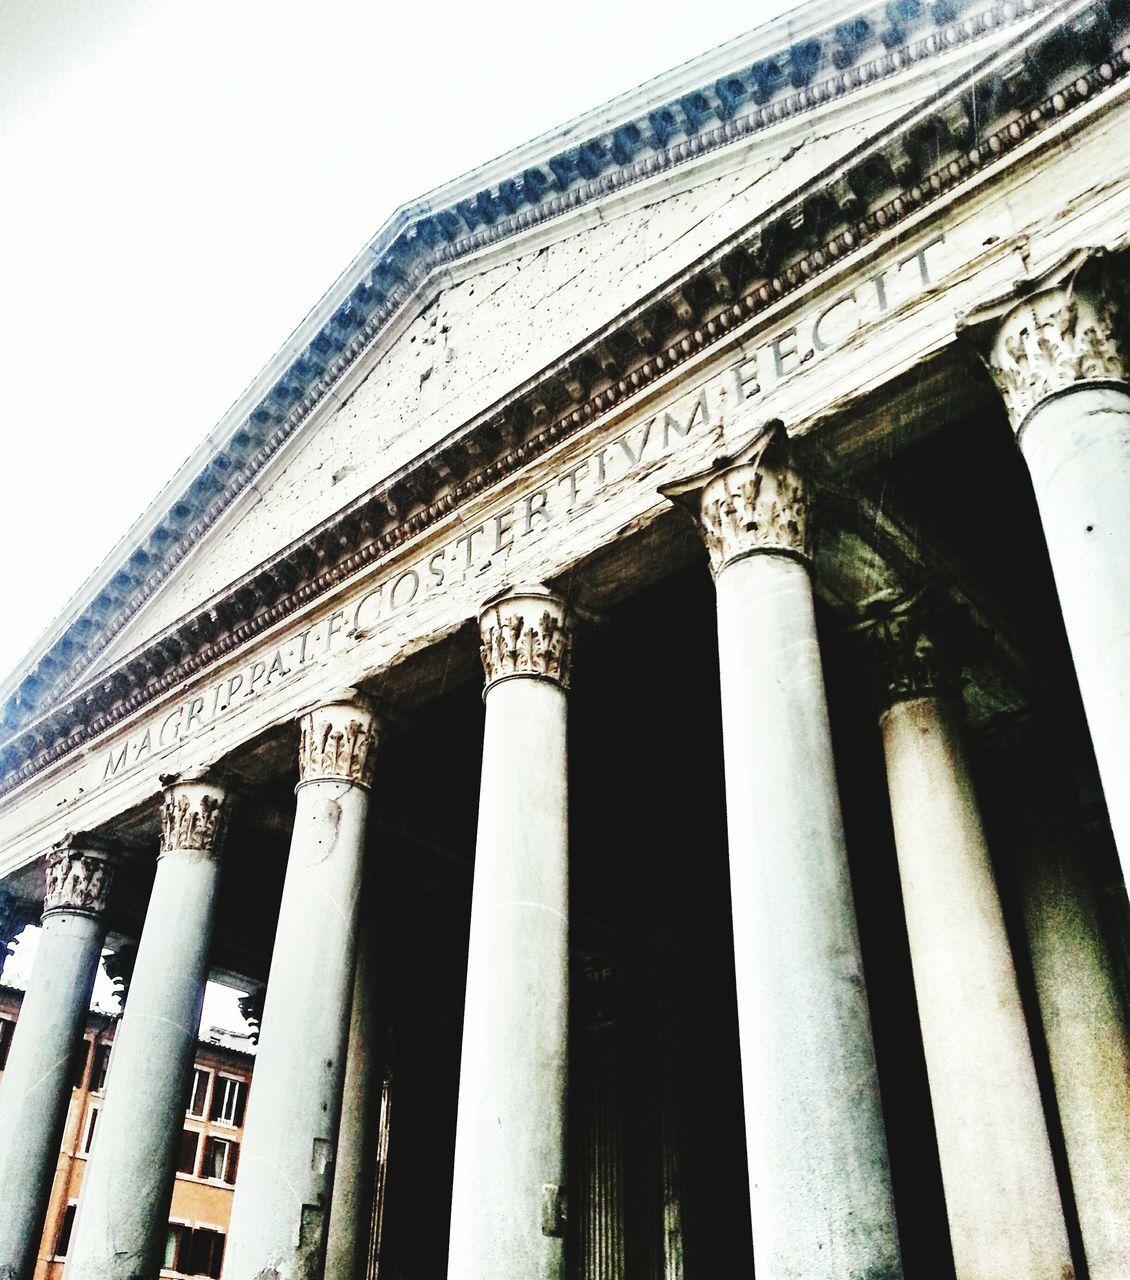 architectural column, architecture, built structure, low angle view, history, building exterior, pediment, outdoors, no people, travel destinations, pillar, day, ancient, sky, ancient civilization